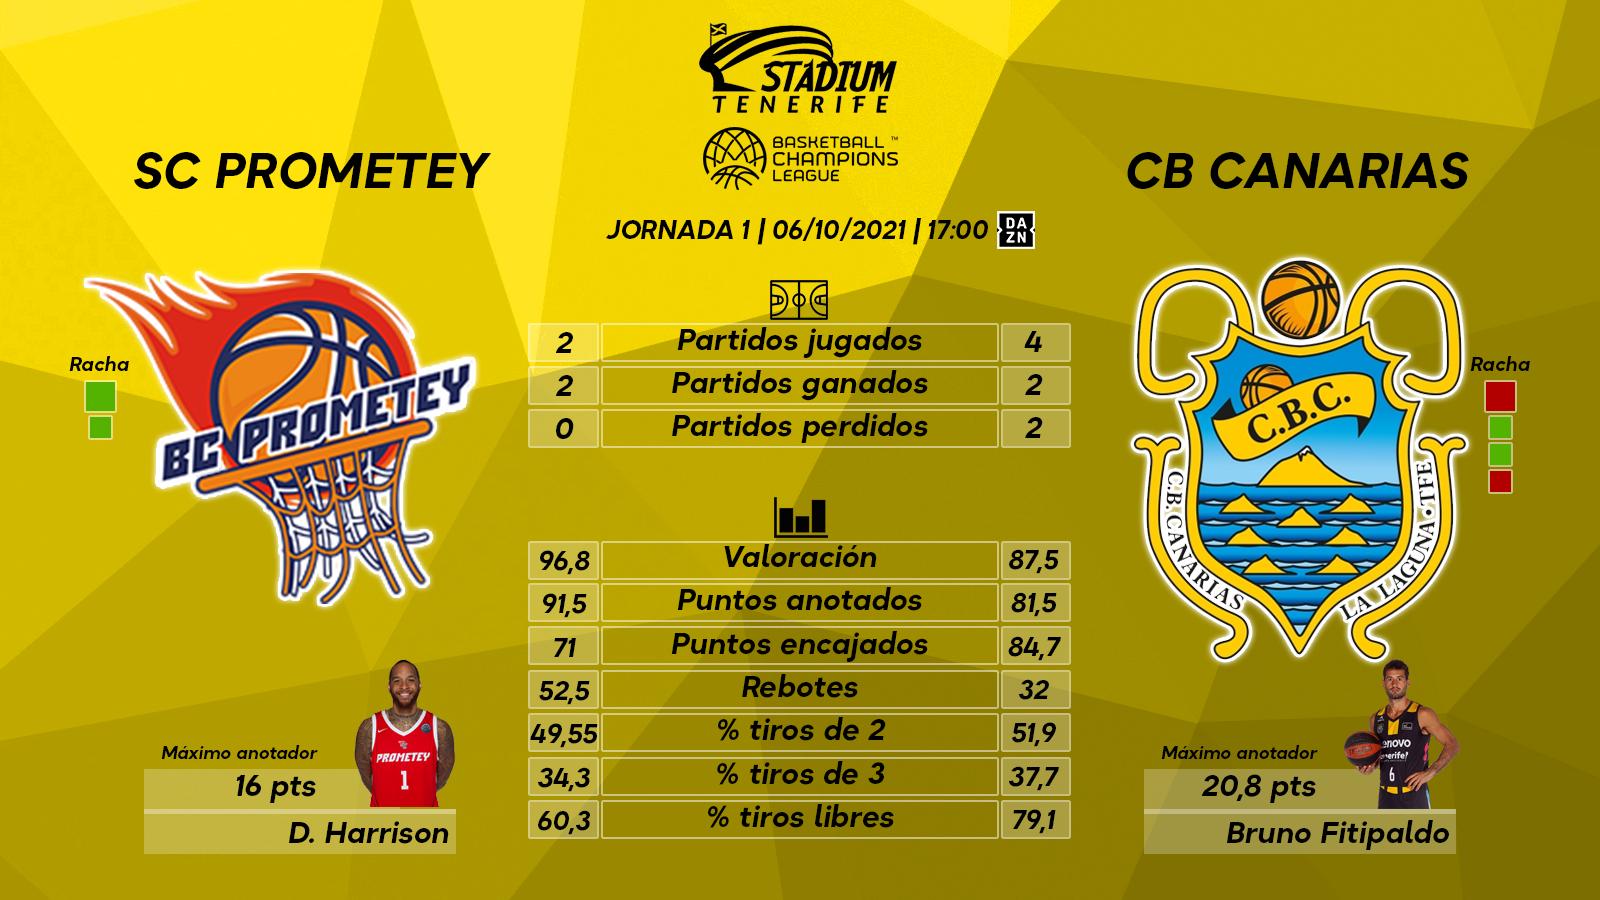 Previa del SC Prometey - Lenovo Tenerife (1ªJ. - Basketball Champions League)